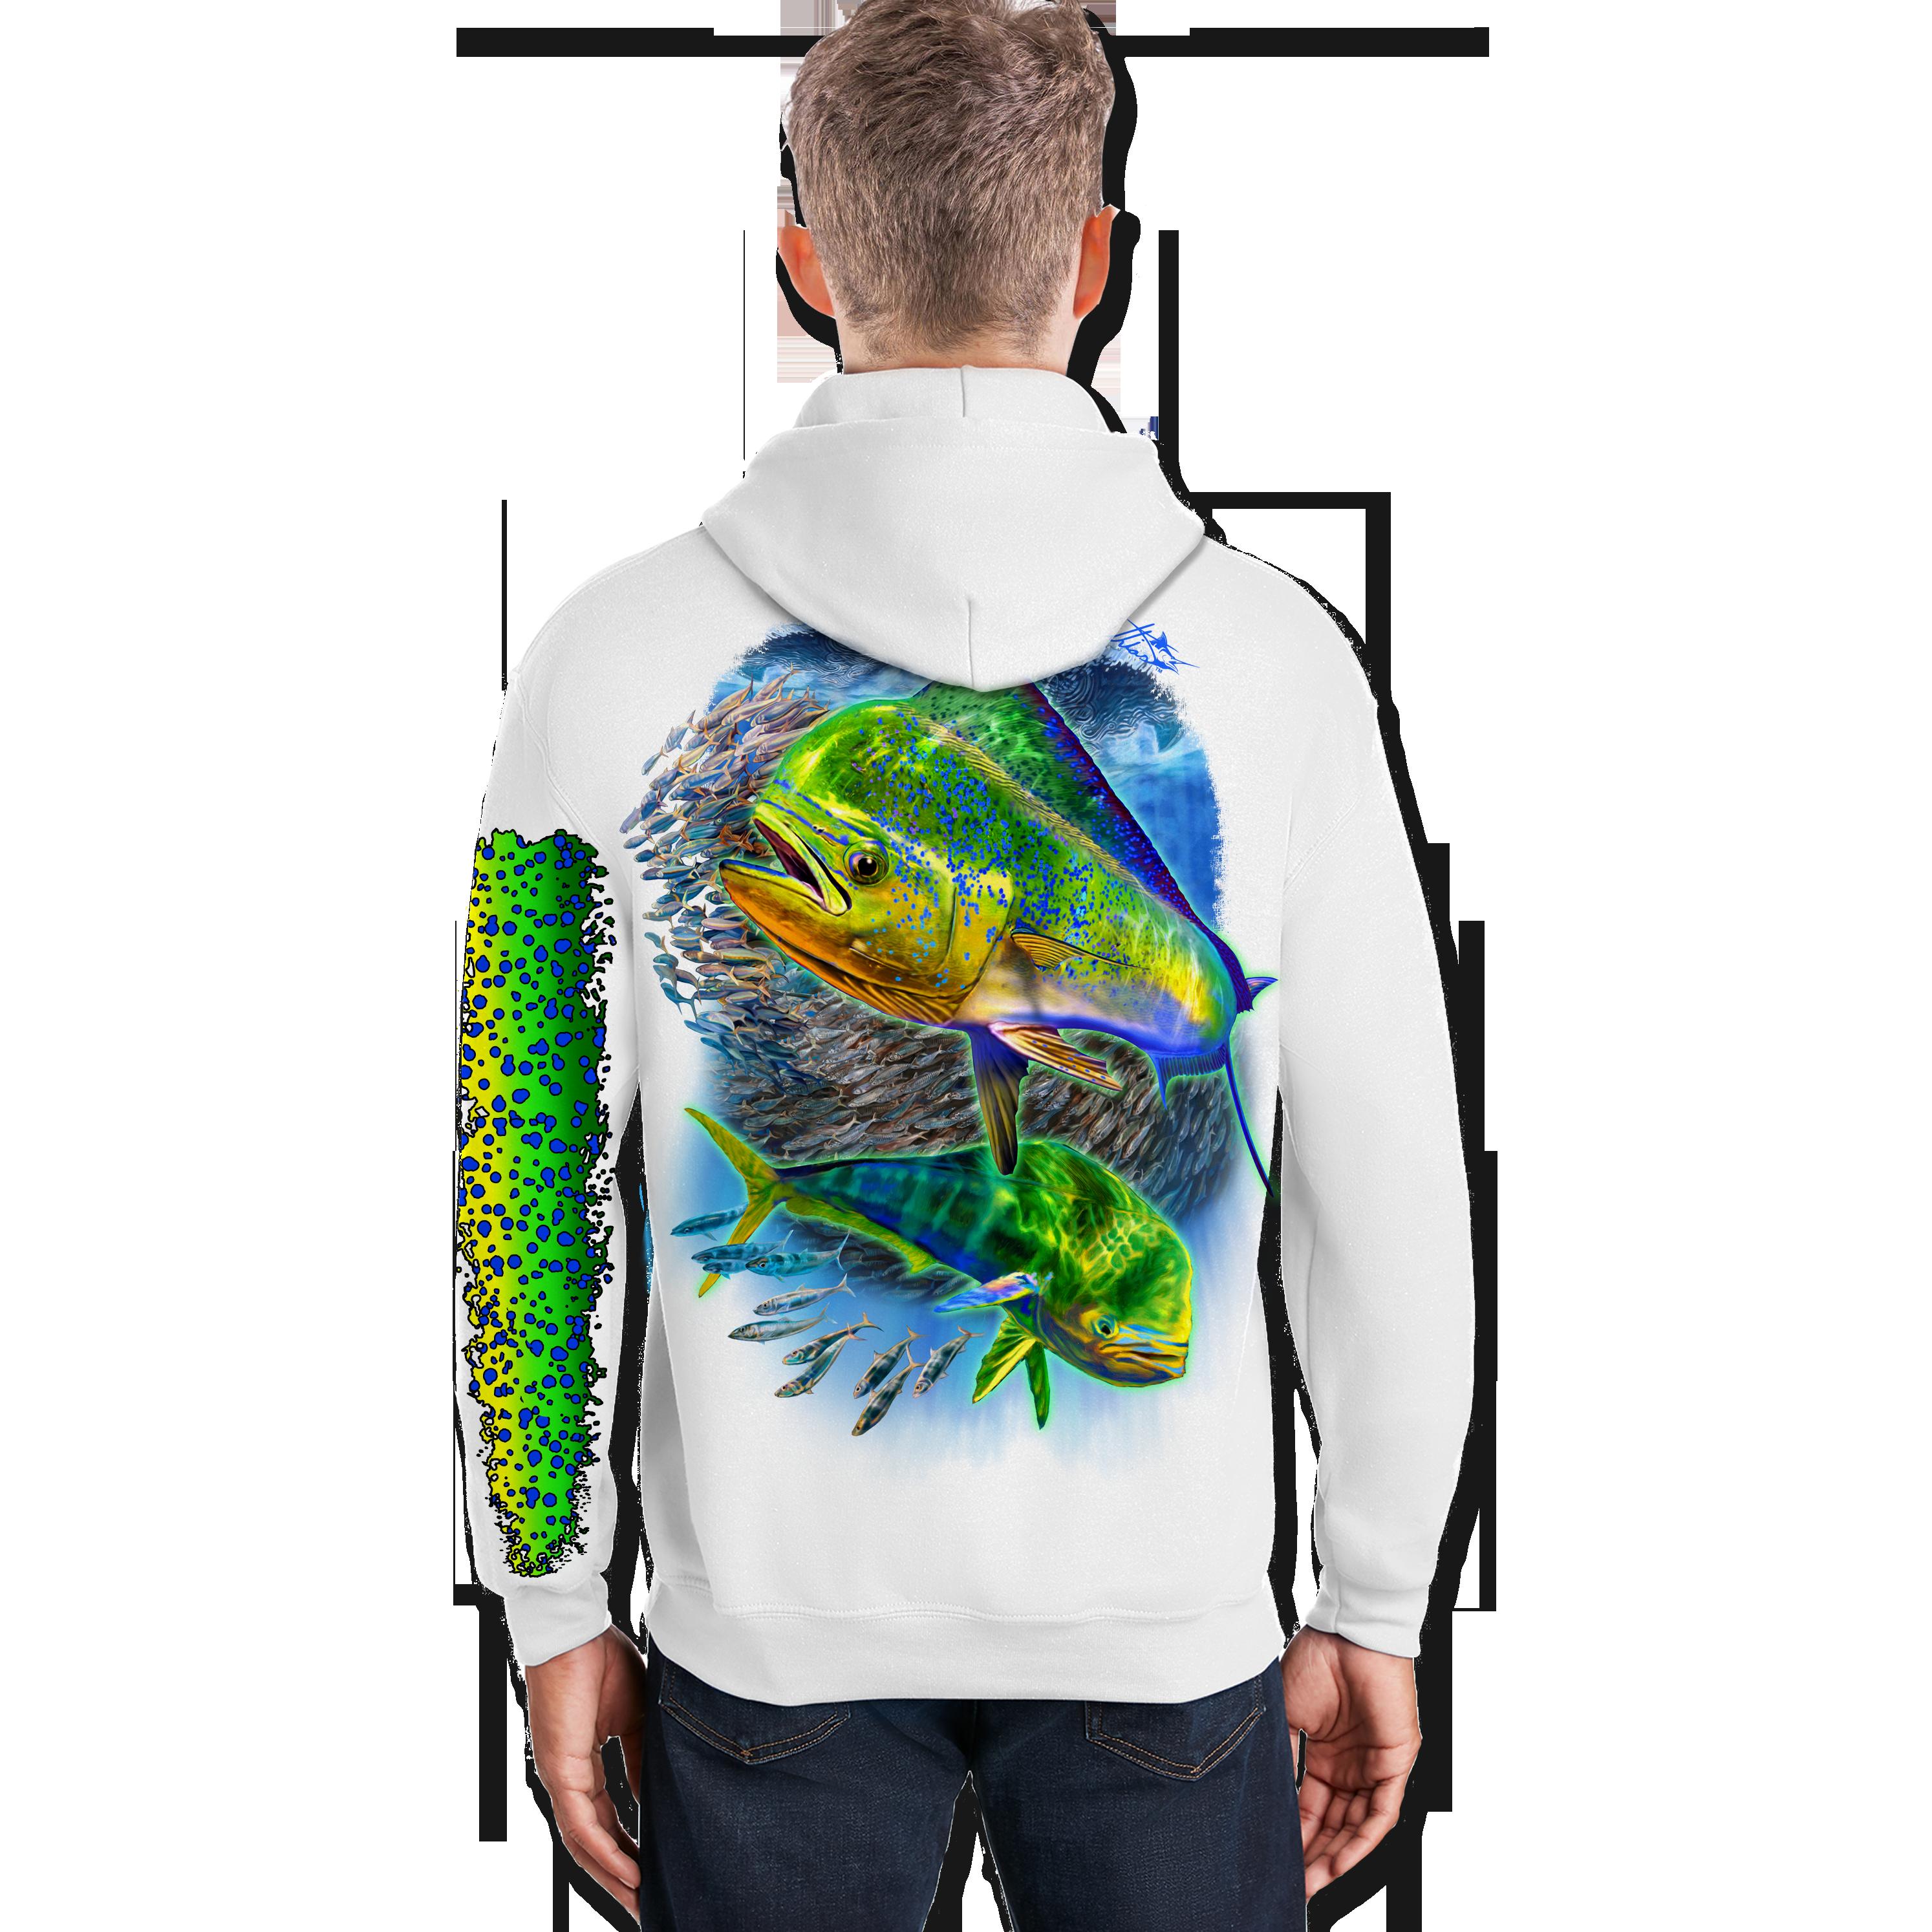 jmfh041-dolphin-fleece-hoodie-white-back.png